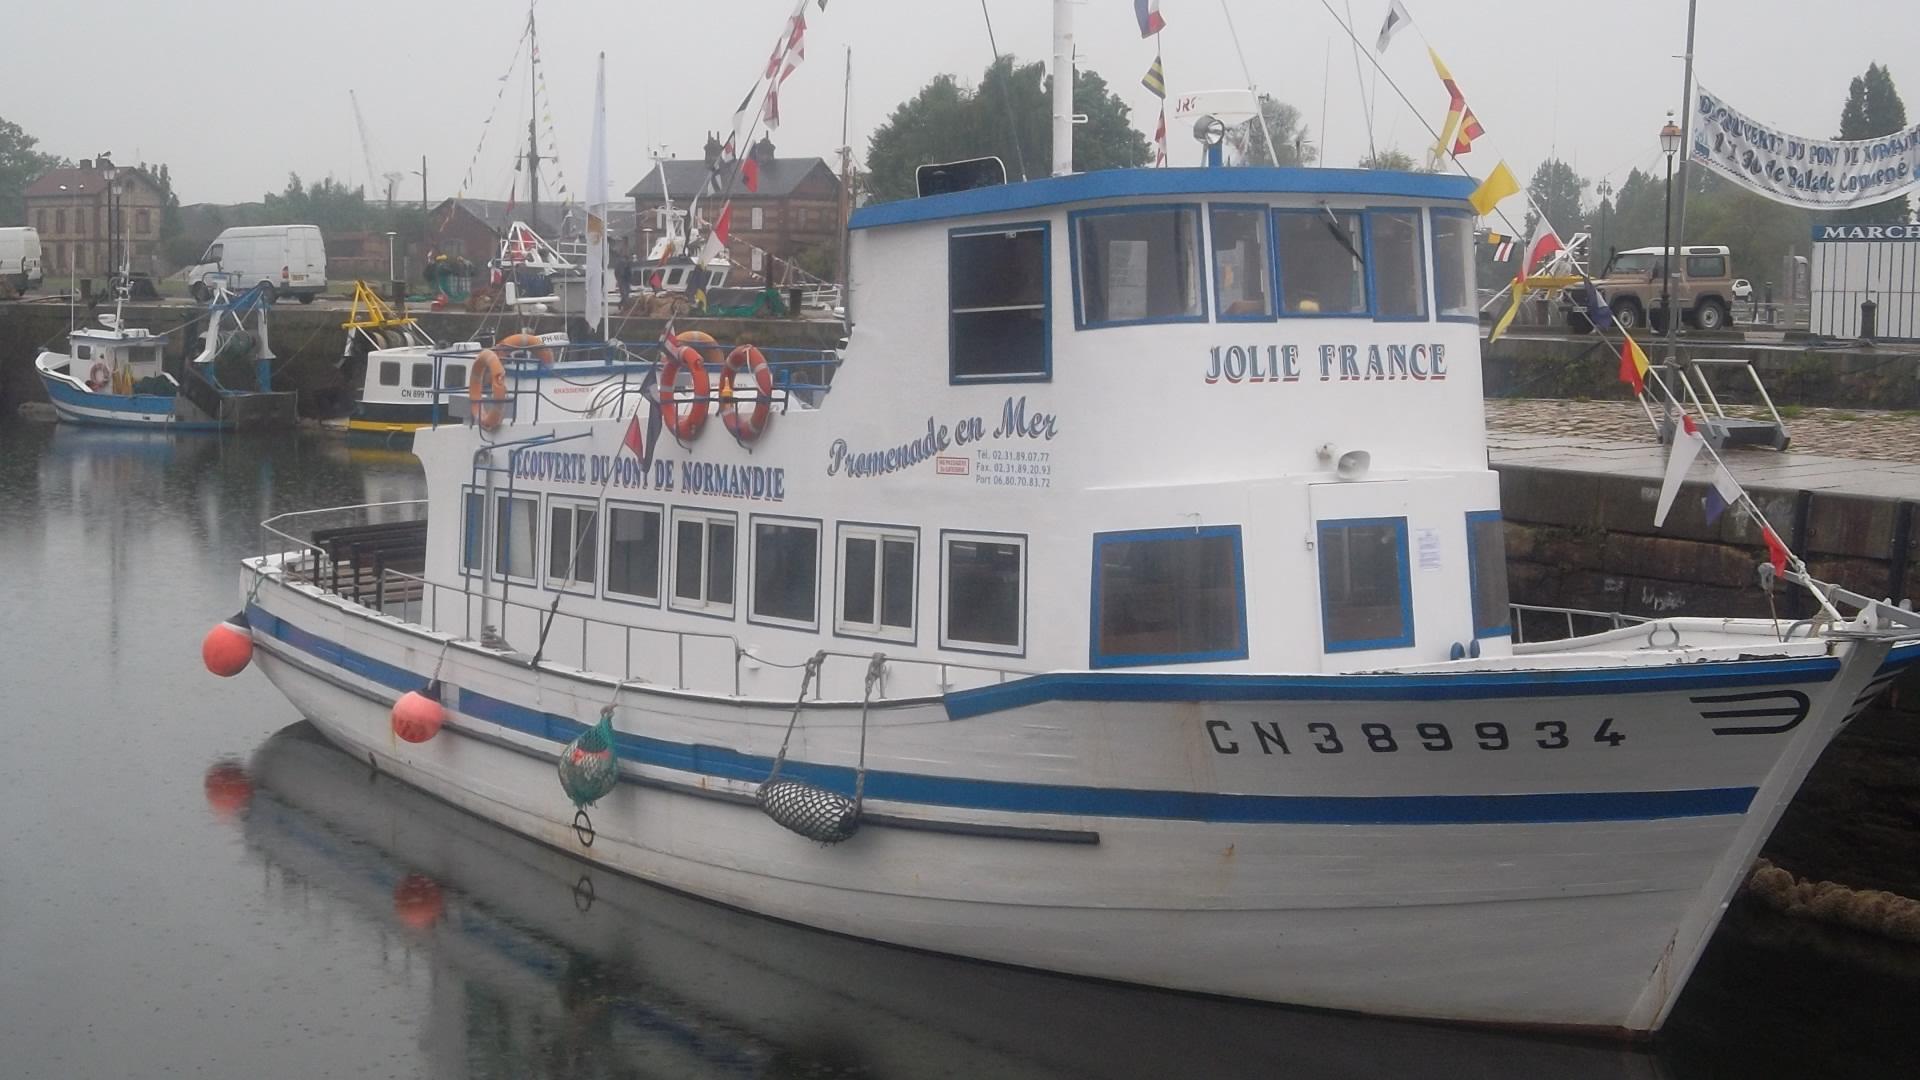 honfleur-jolie-france-side-my13